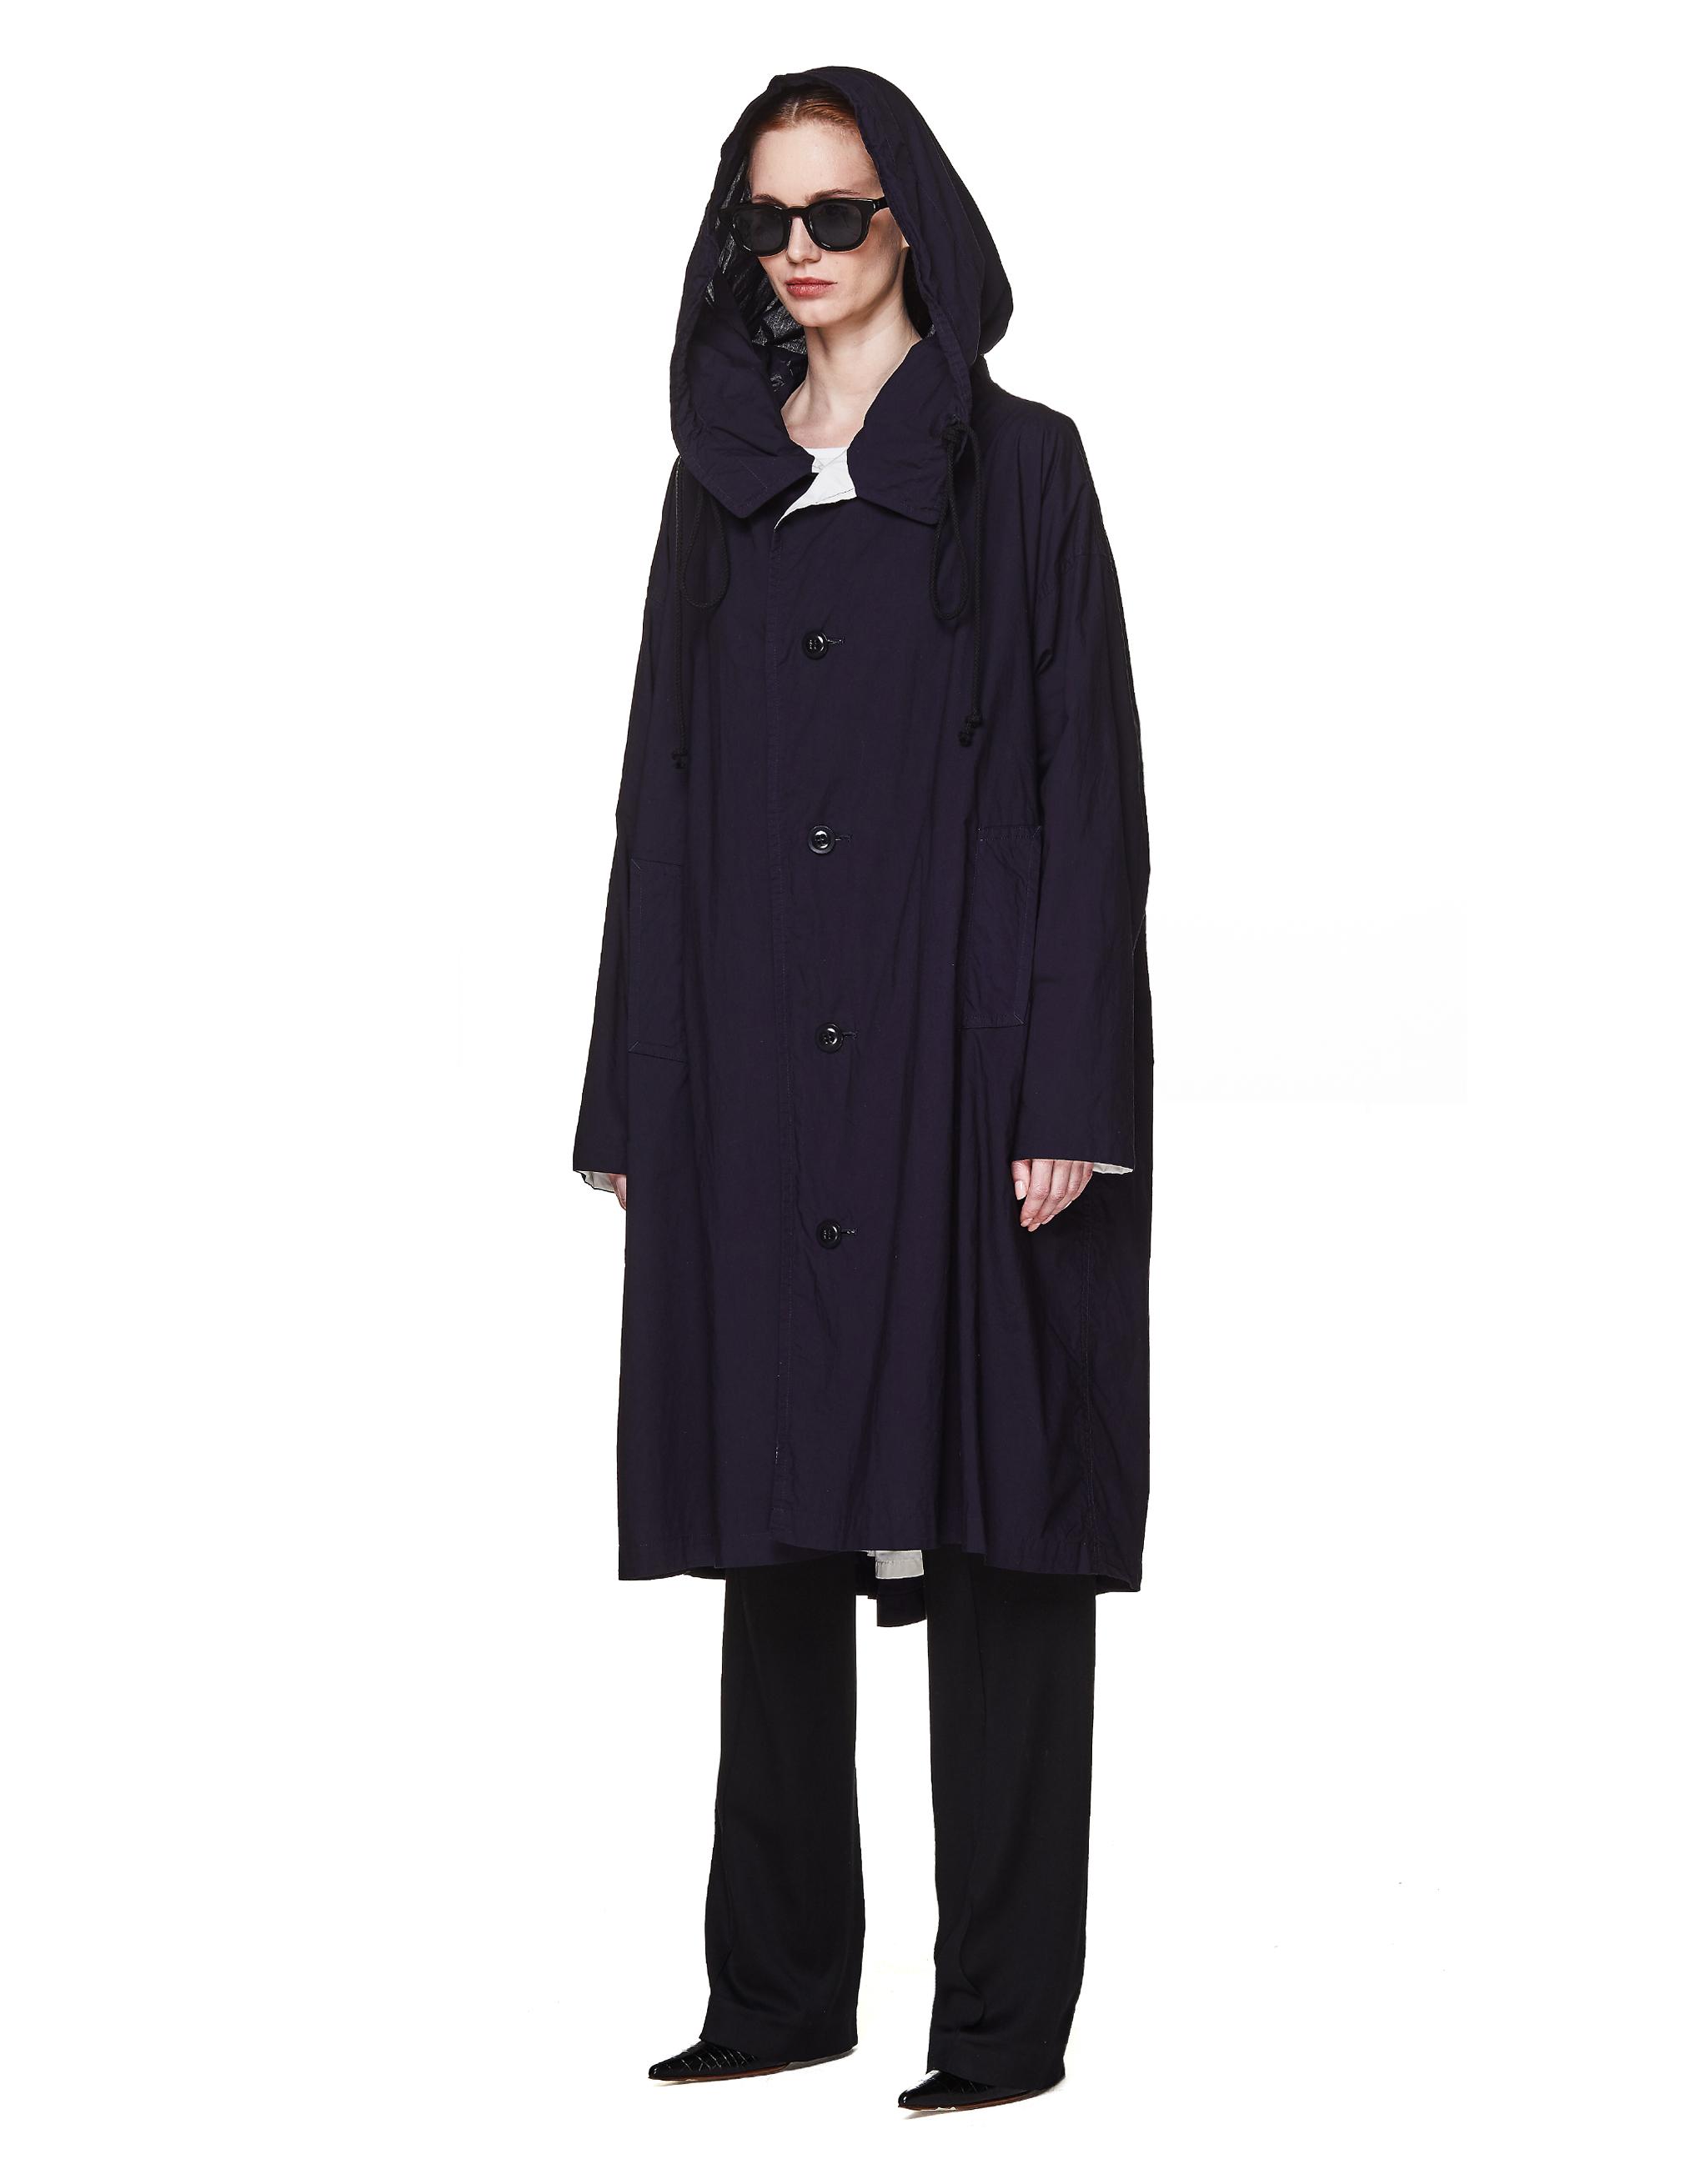 Y's Black Cotton Hooded Coat